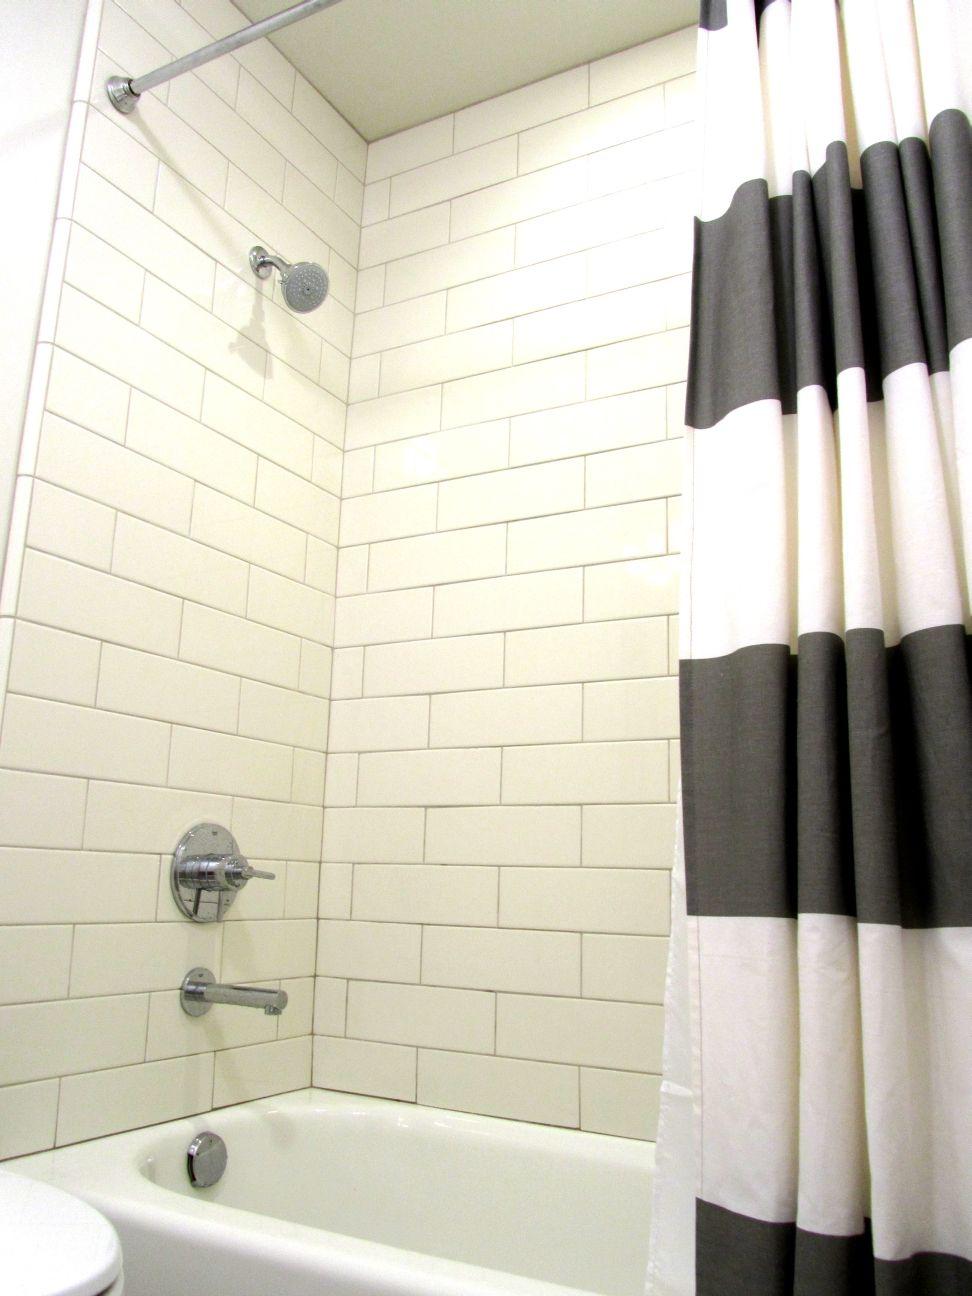 Shower Curtain Rod West Elm Target Shower Tile Grout